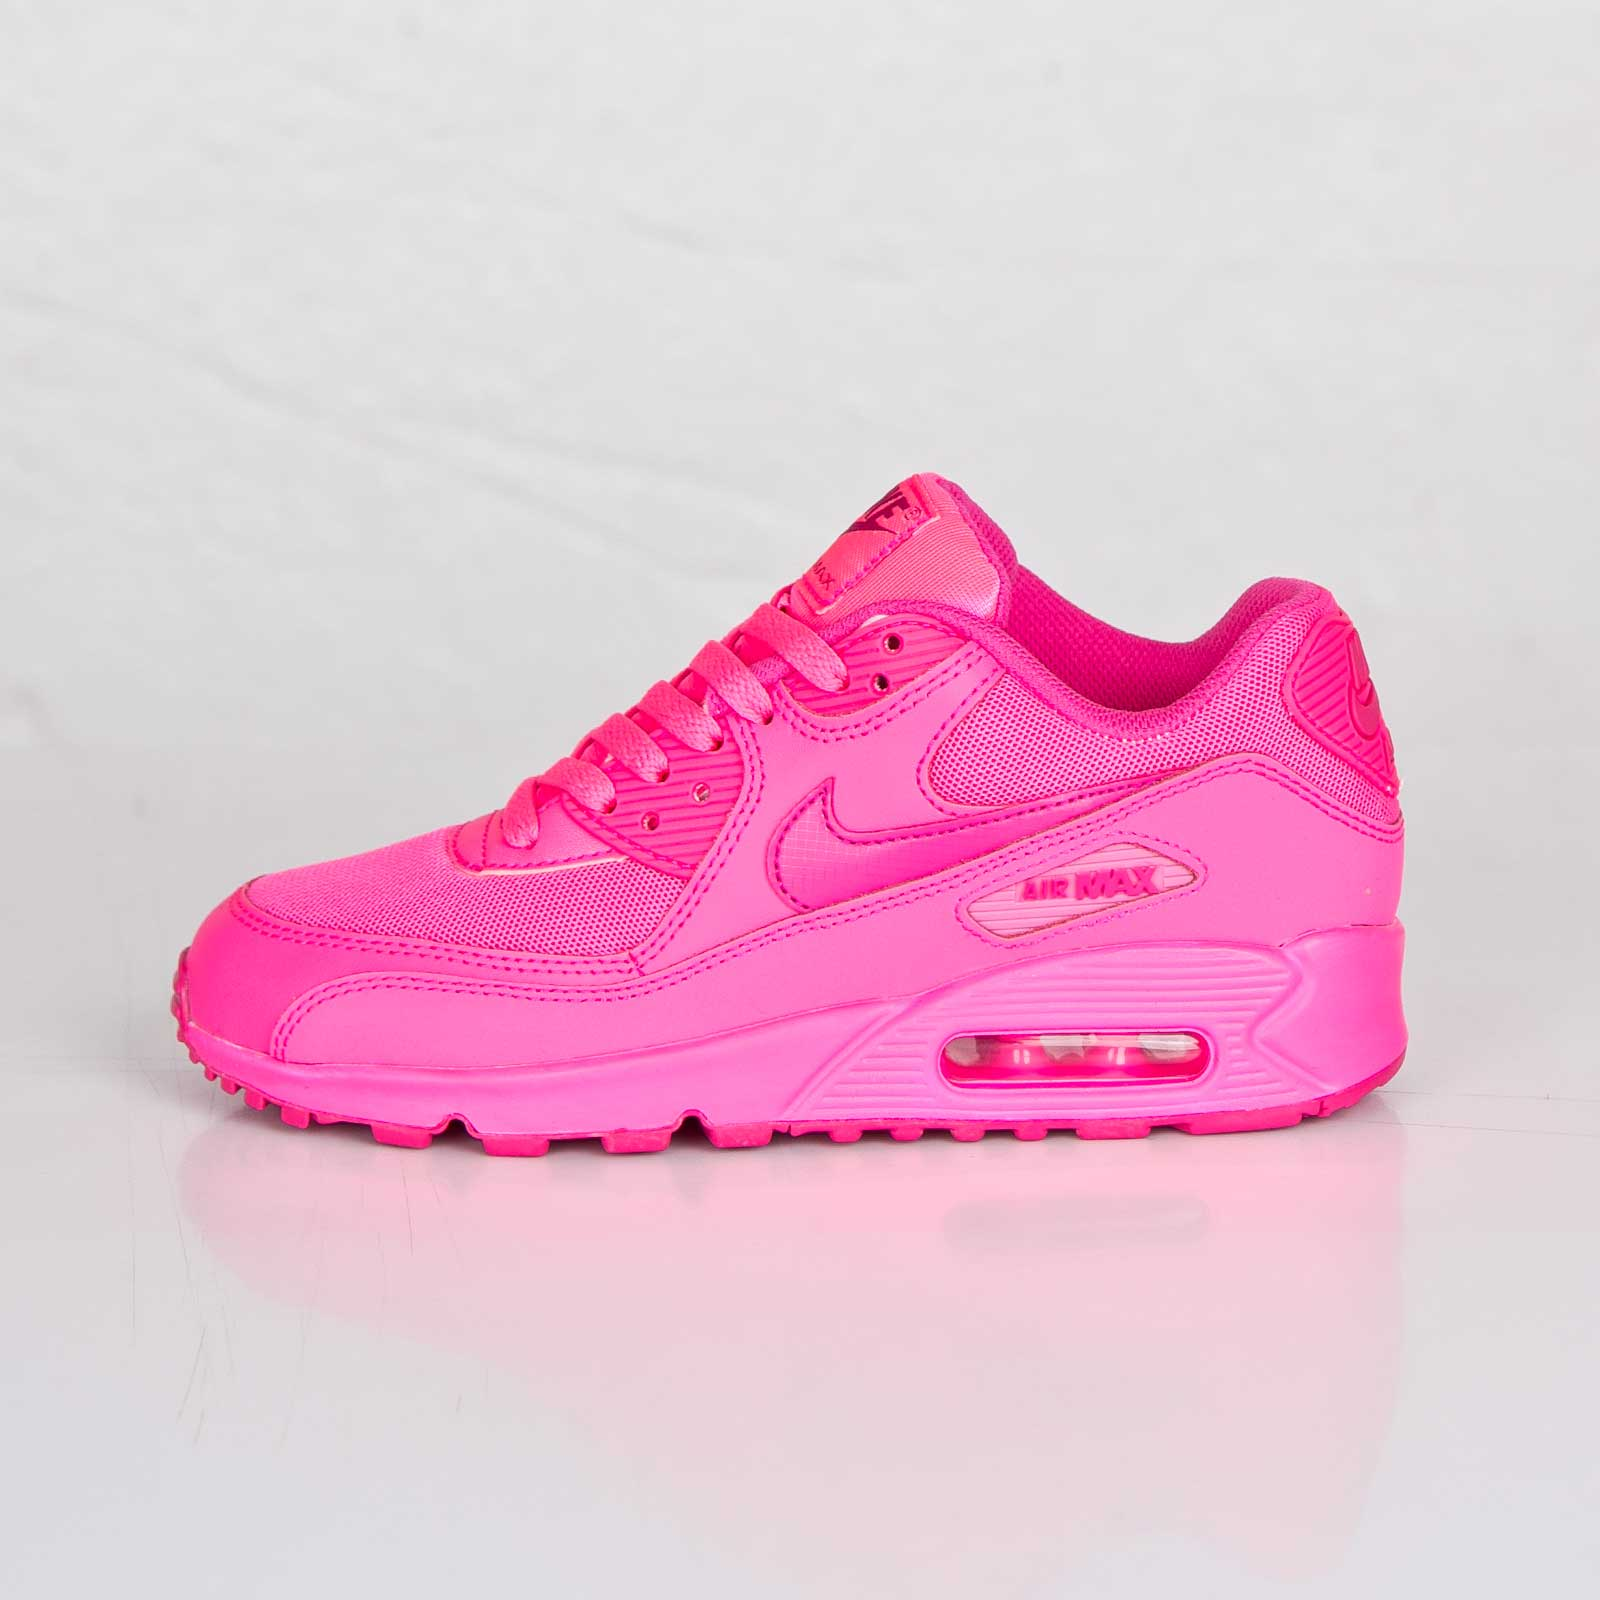 da95fe2c86c2 Nike Air Max 90 2007 (GS) - 345017-601 - Sneakersnstuff